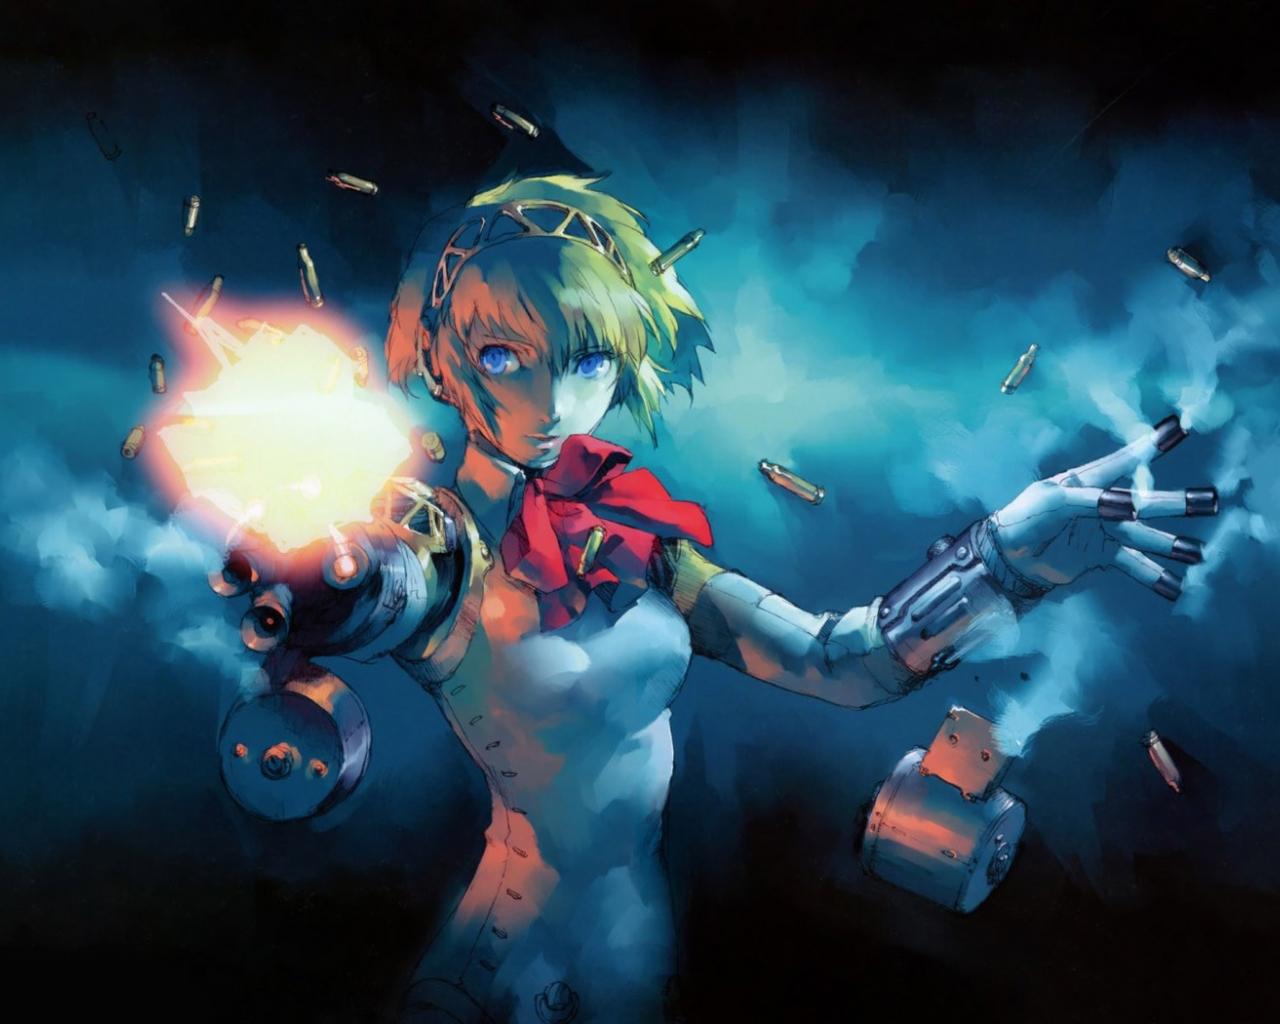 Free Download Aigis Shin Megami Tensei Persona 3 Wallpaper 10025